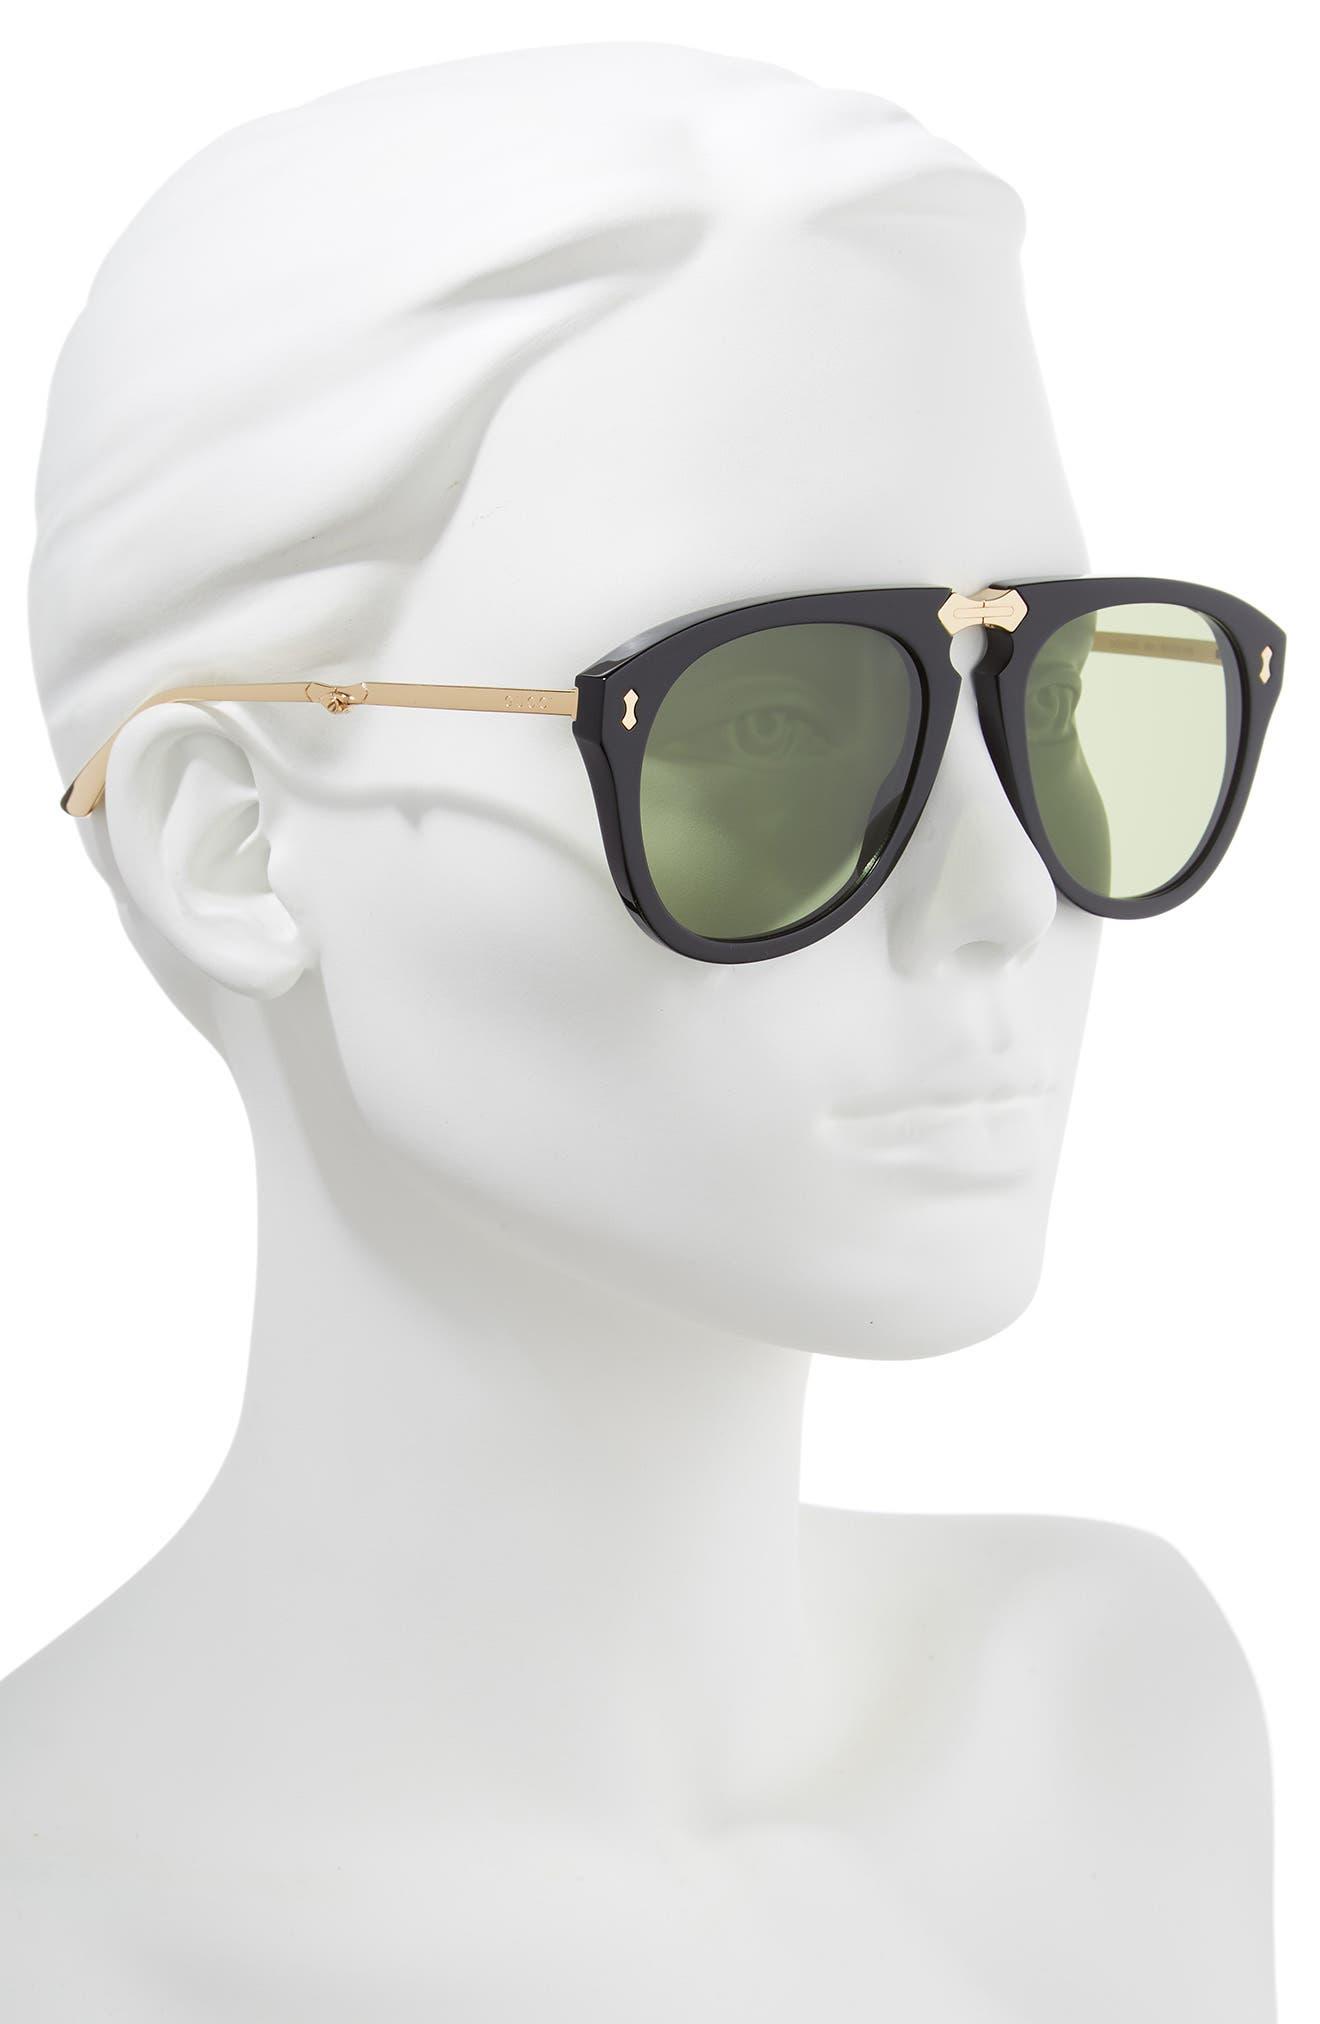 56mm Aviator Sunglasses,                             Alternate thumbnail 2, color,                             BLACK/ GOLD/ GREEN